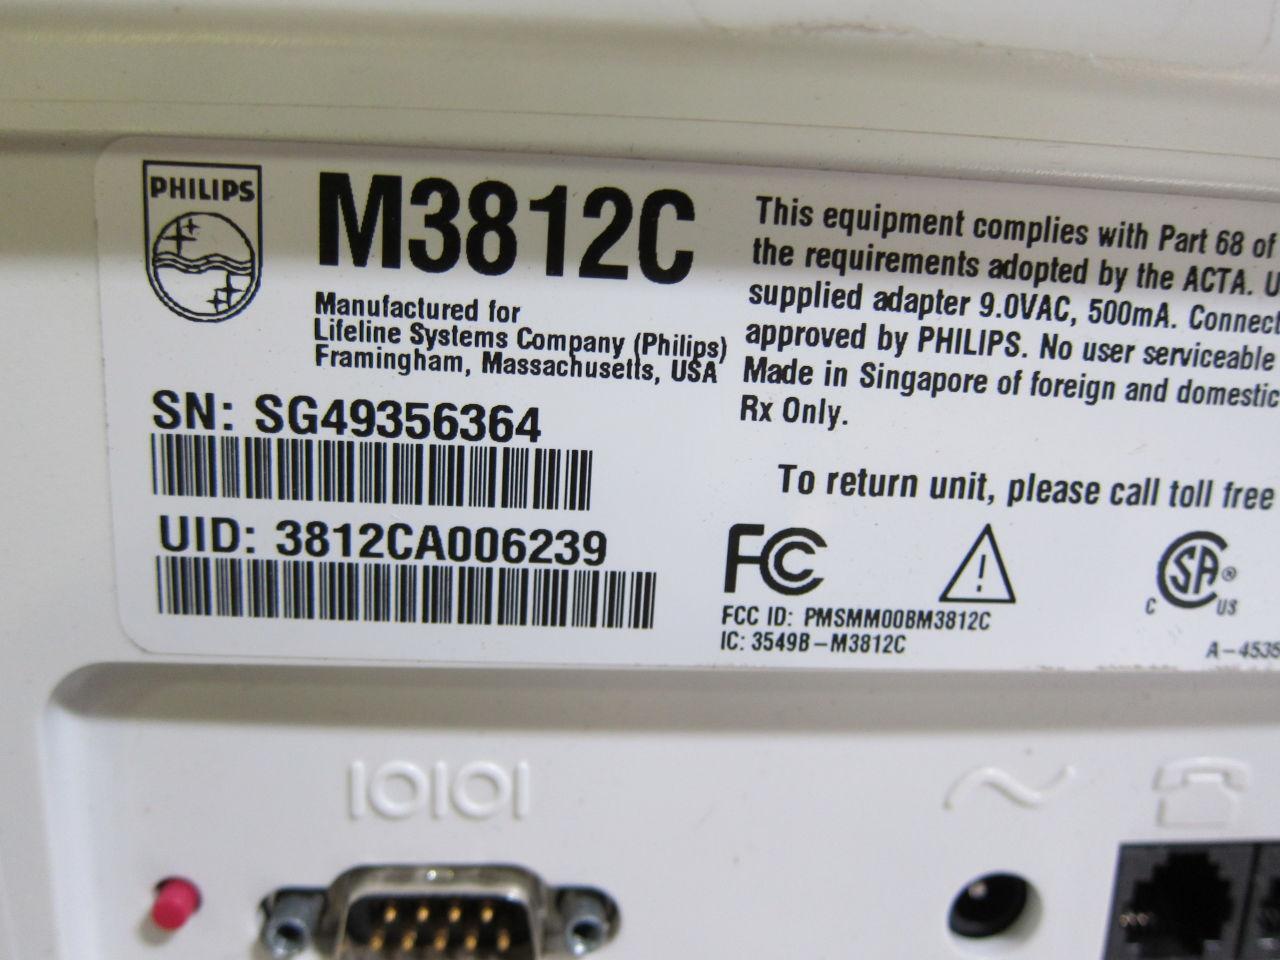 PHILIPS M3812C  - Lot of 5 Telemetry